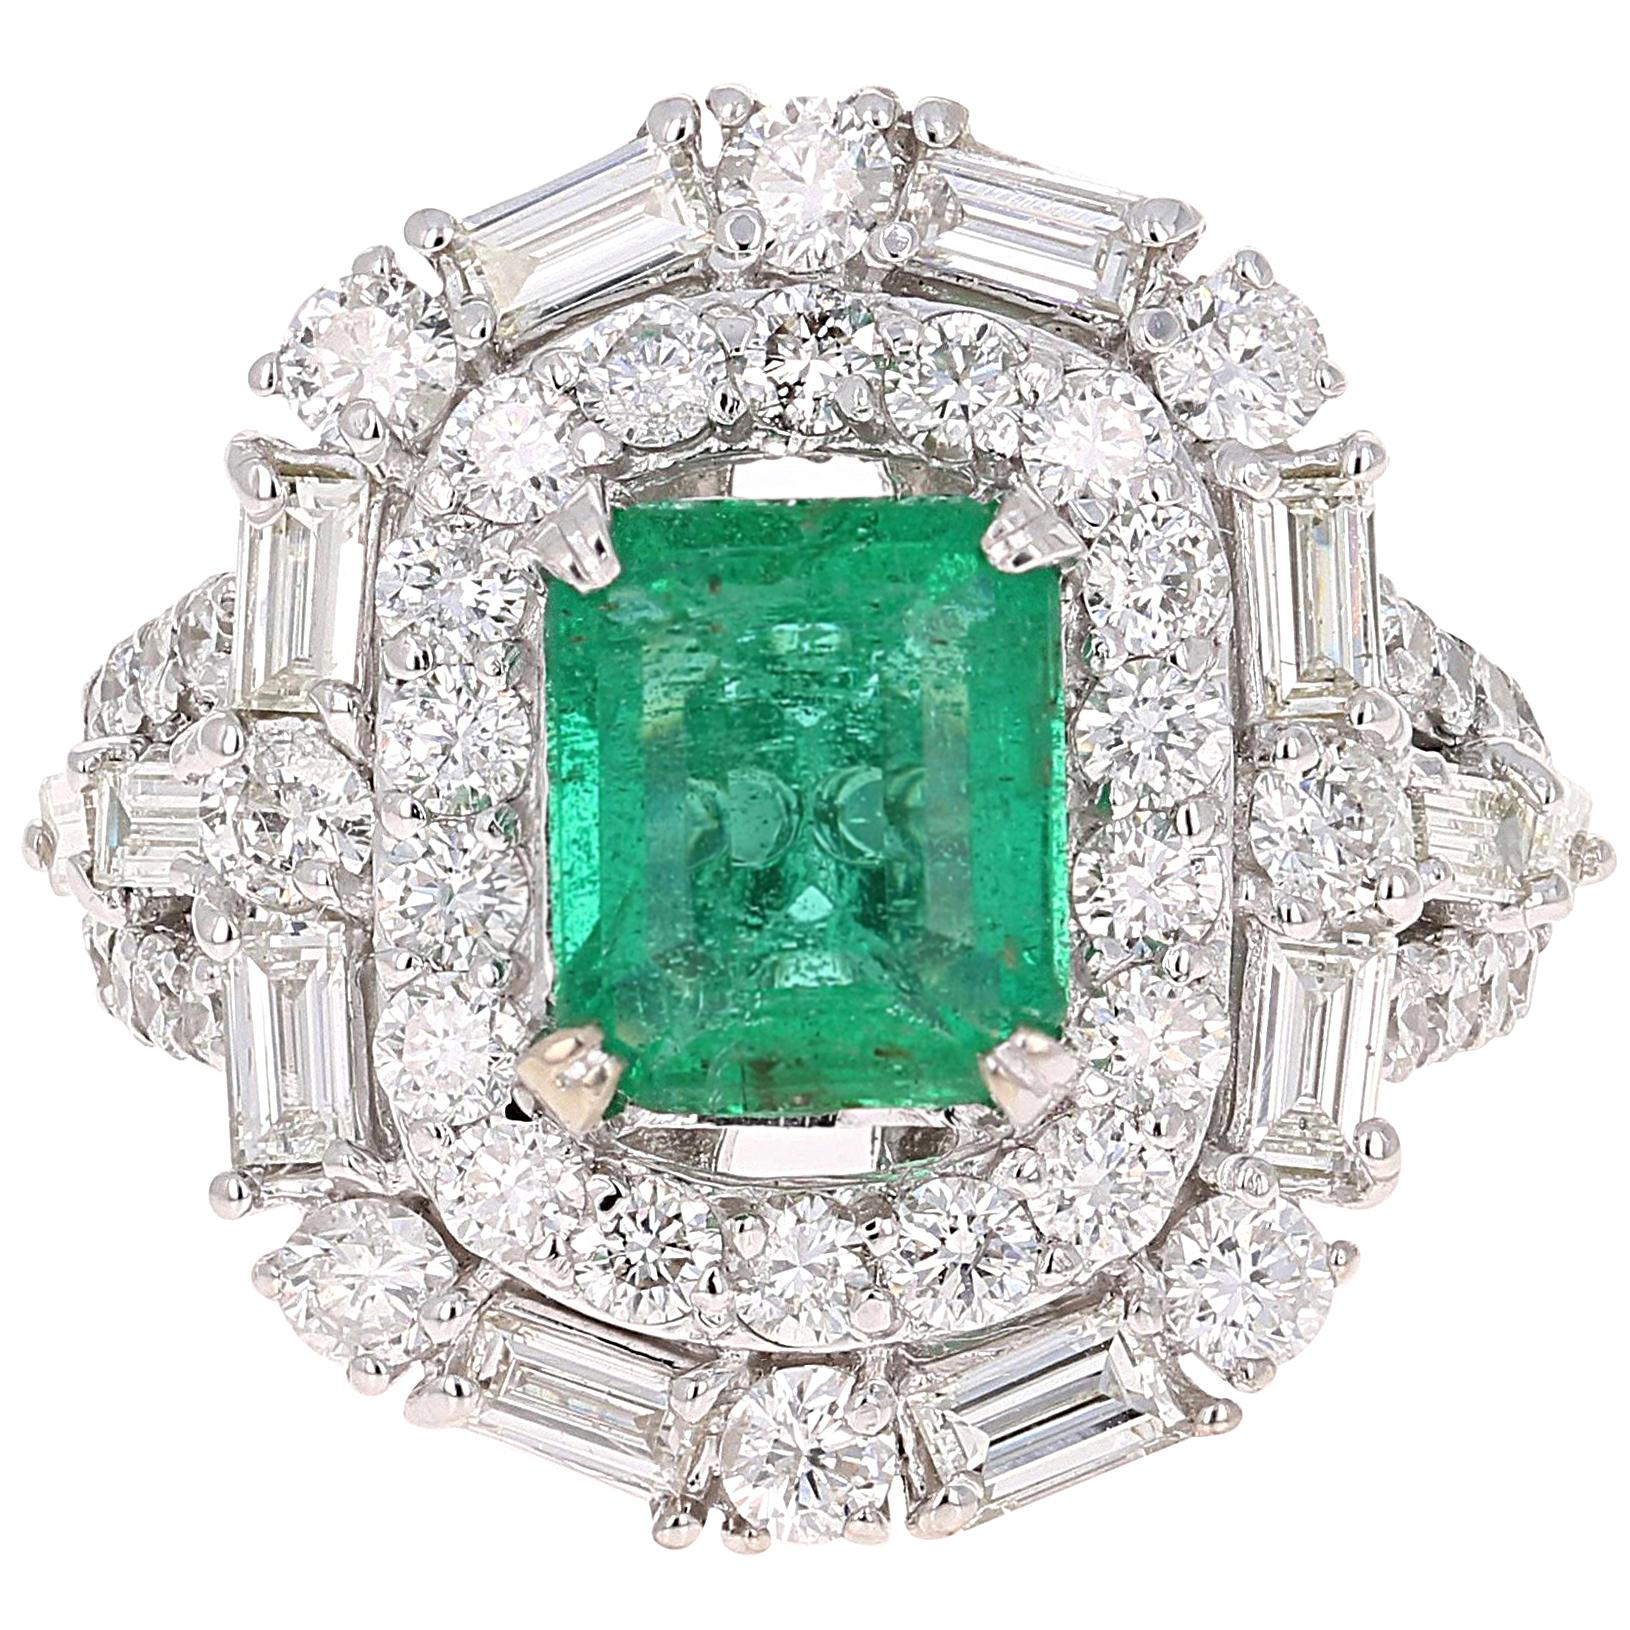 GIA Certified Emerald Diamond 18K White Gold Art-Deco Inspired Cocktail Ring